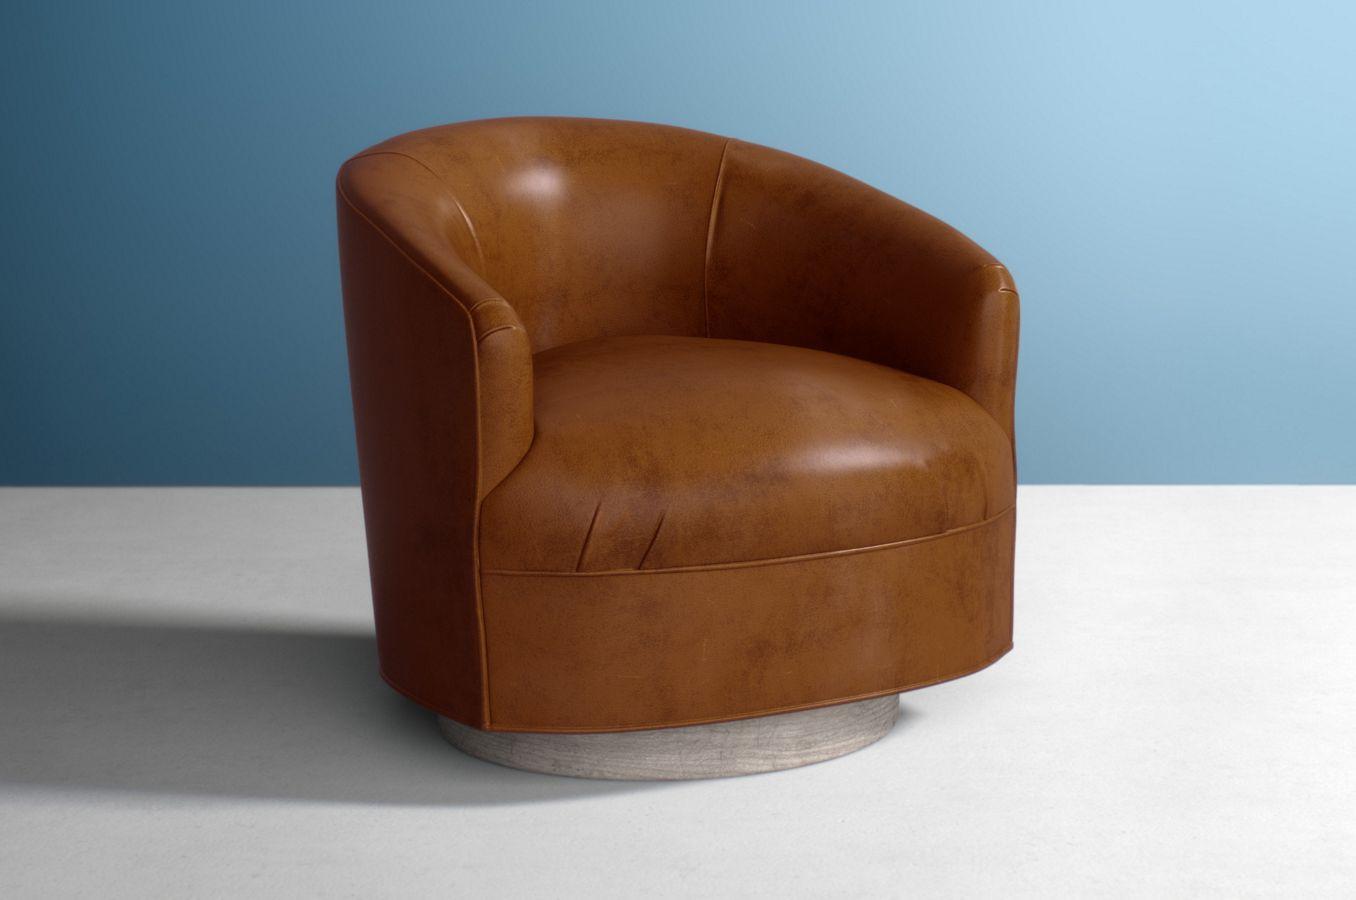 Anthropologie Amoret Swivel Chair